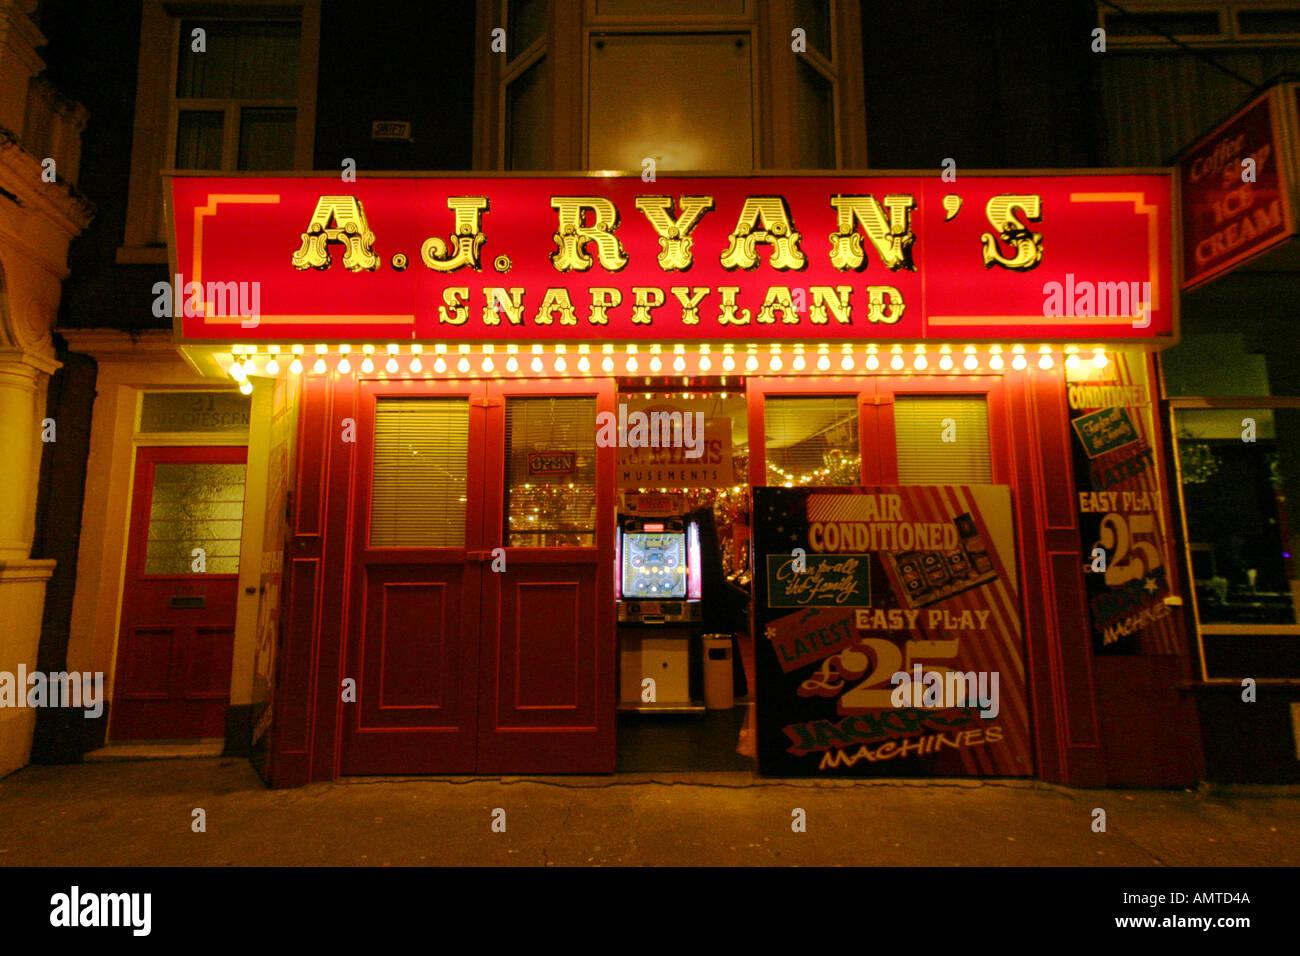 amusement arcade night time shop front - Stock Image